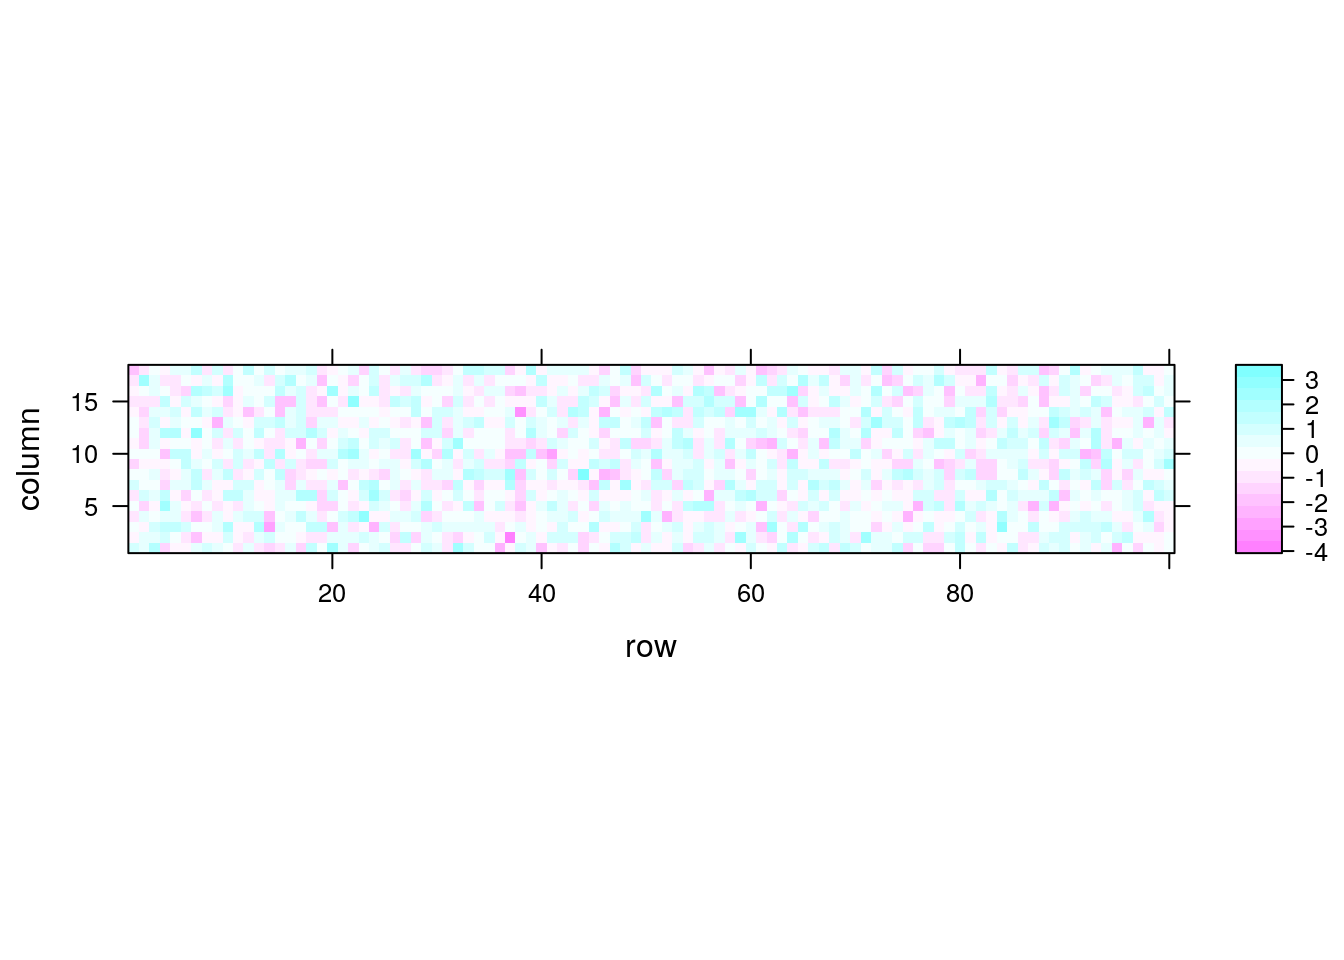 Chapter 8 Linear Mixed Models | R (BGU course)